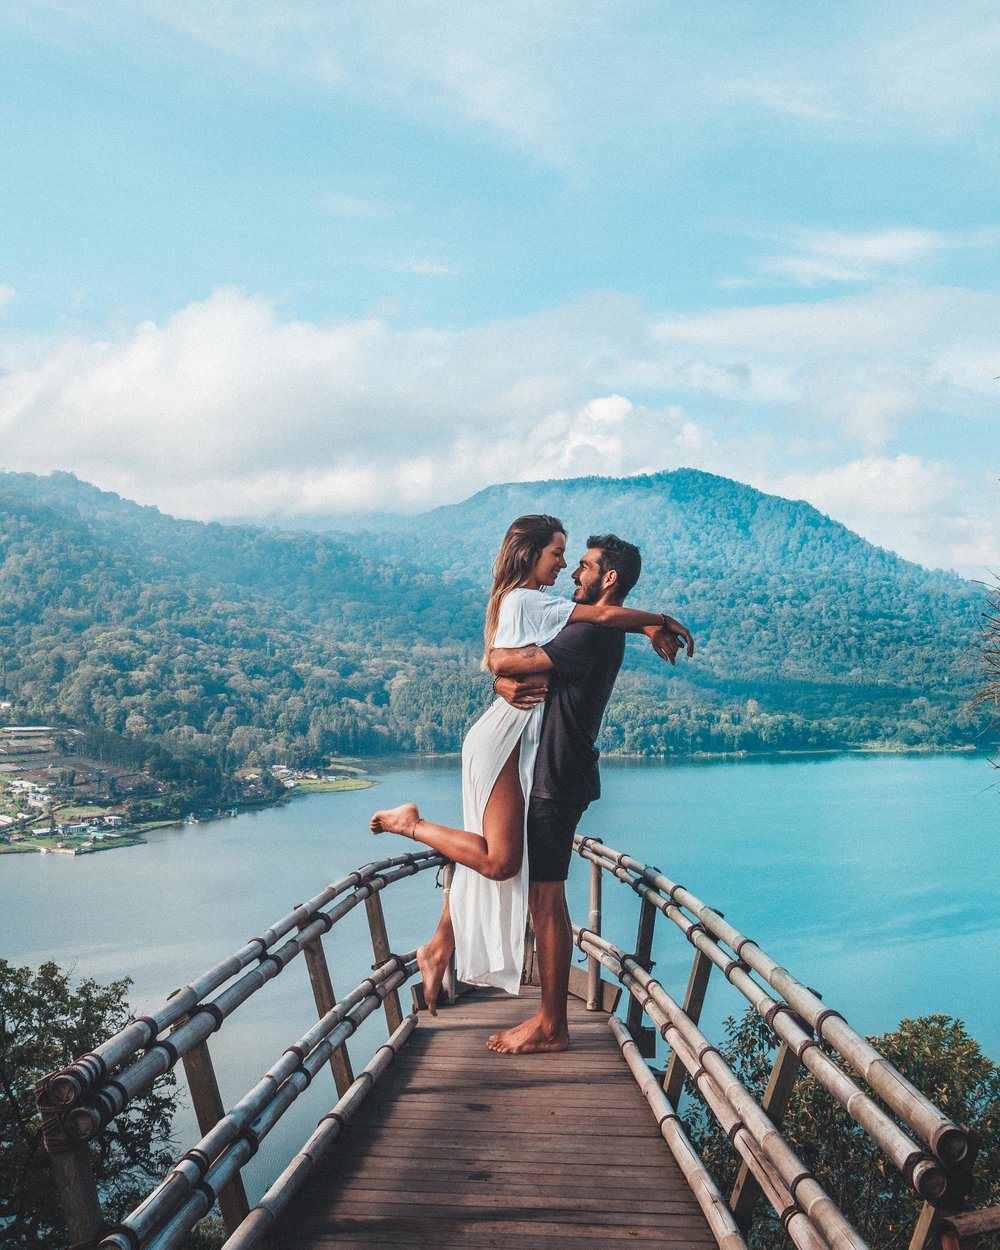 freeoversea travel couple boat munduk lake view swings bali indonesia asia